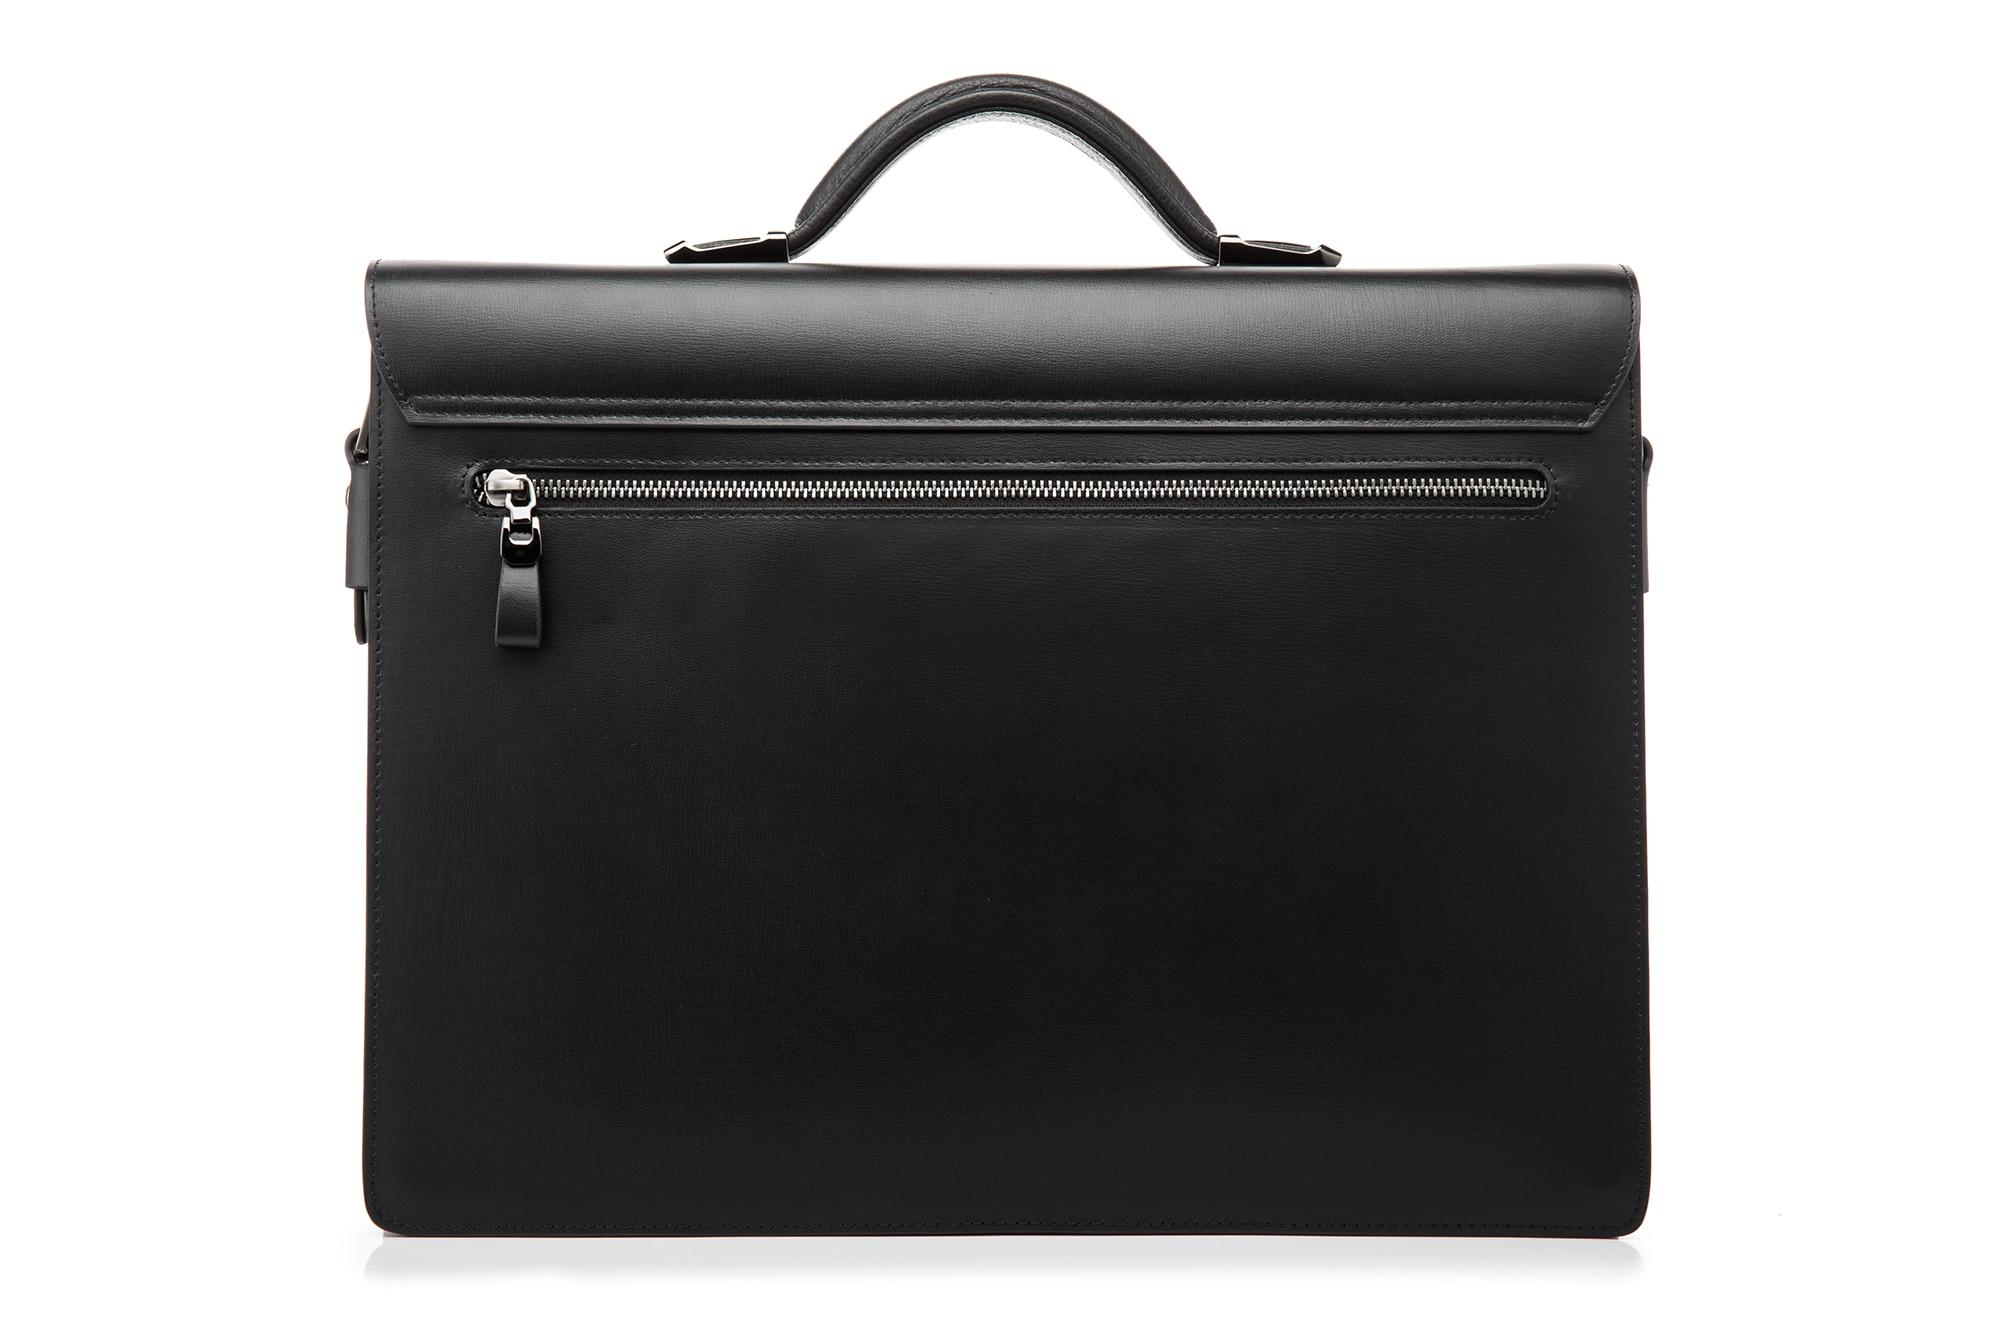 Leder Attache Männer Tasche Bag Yinte Und Messenger Aktentasche Große T8191 6 Schulter Schwarz Dicker Totes Black Business Anwalt Fall pw8dq